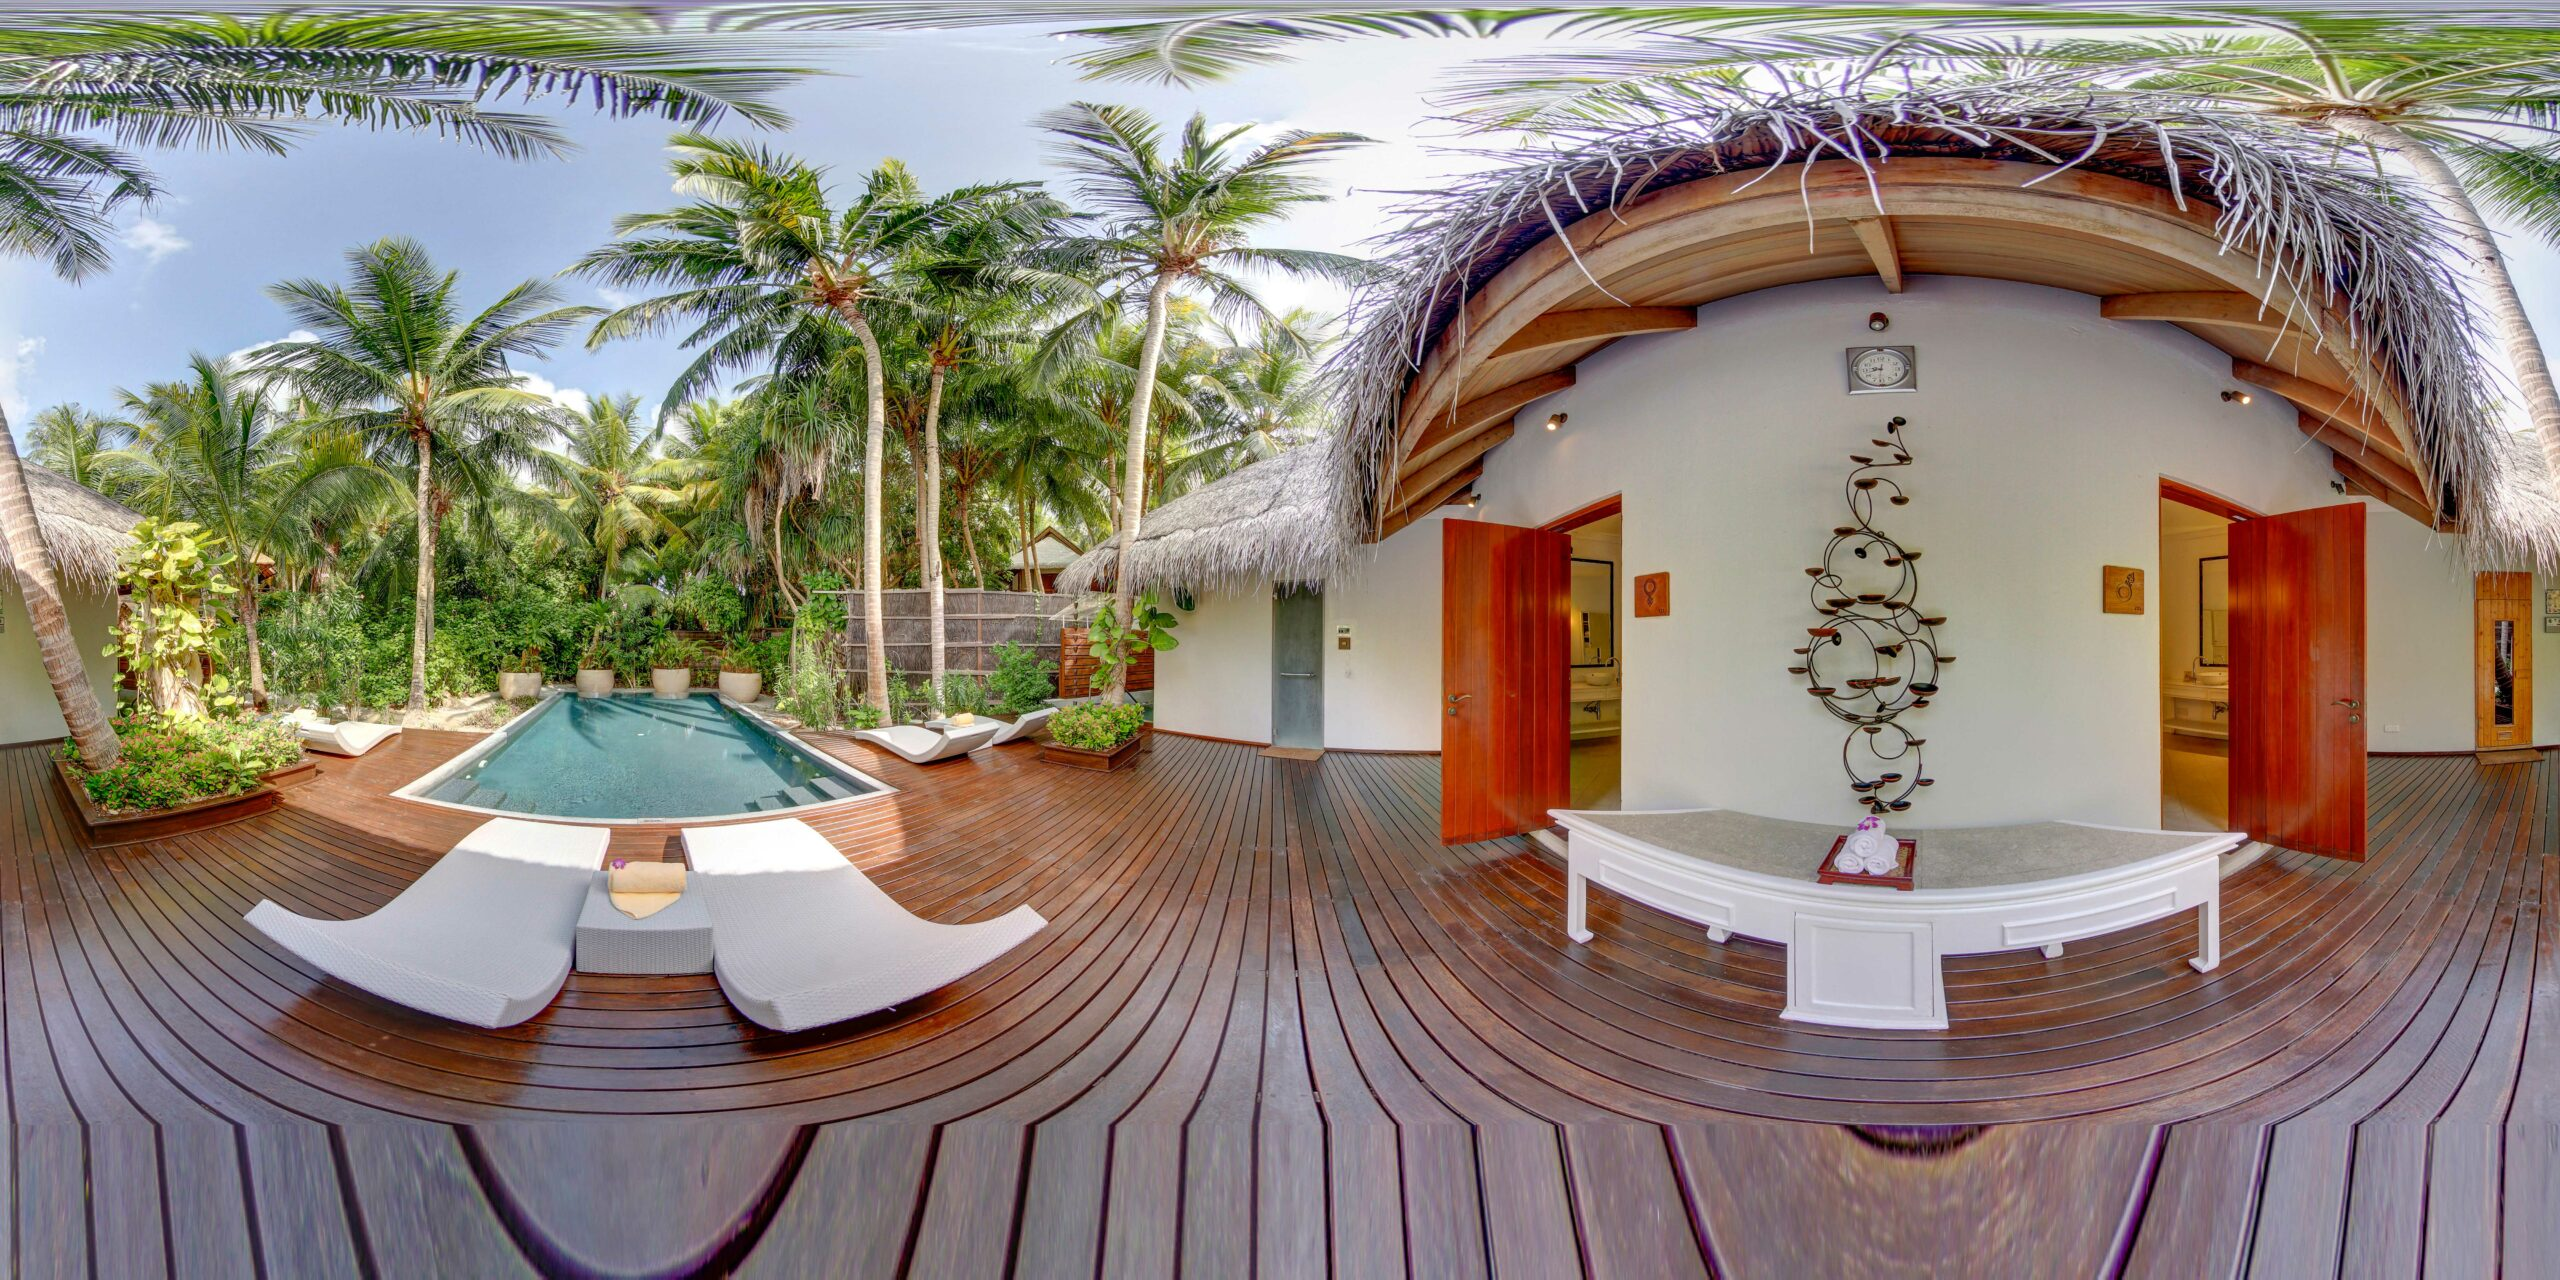 Devarana Spa, Pool area, sauna, hot and cold jacuzzi